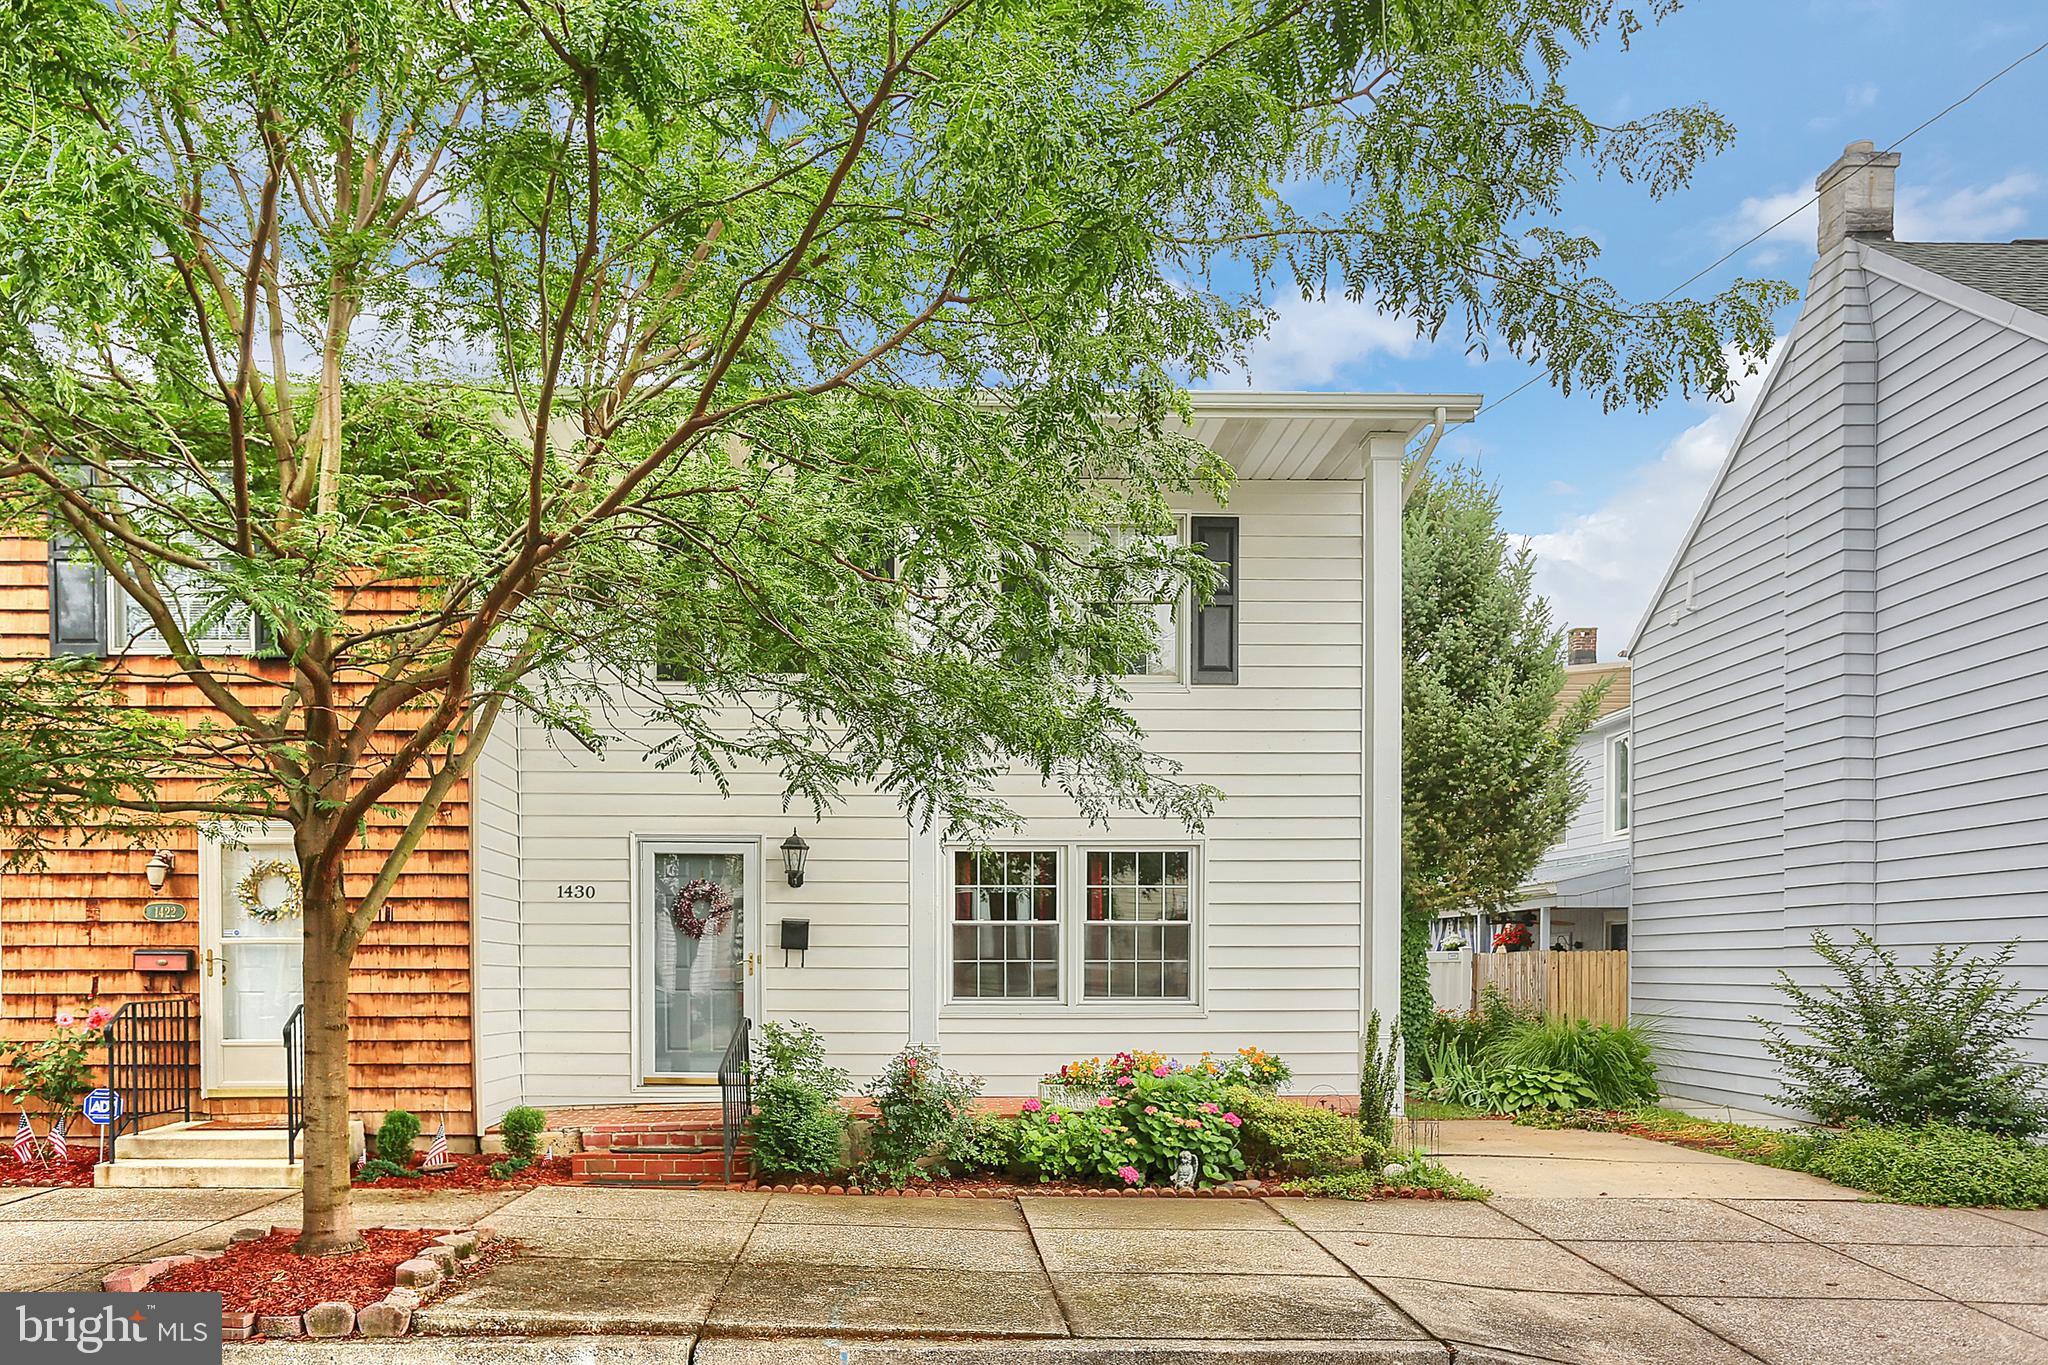 1430 GREEN STREET, HARRISBURG, PA 17102